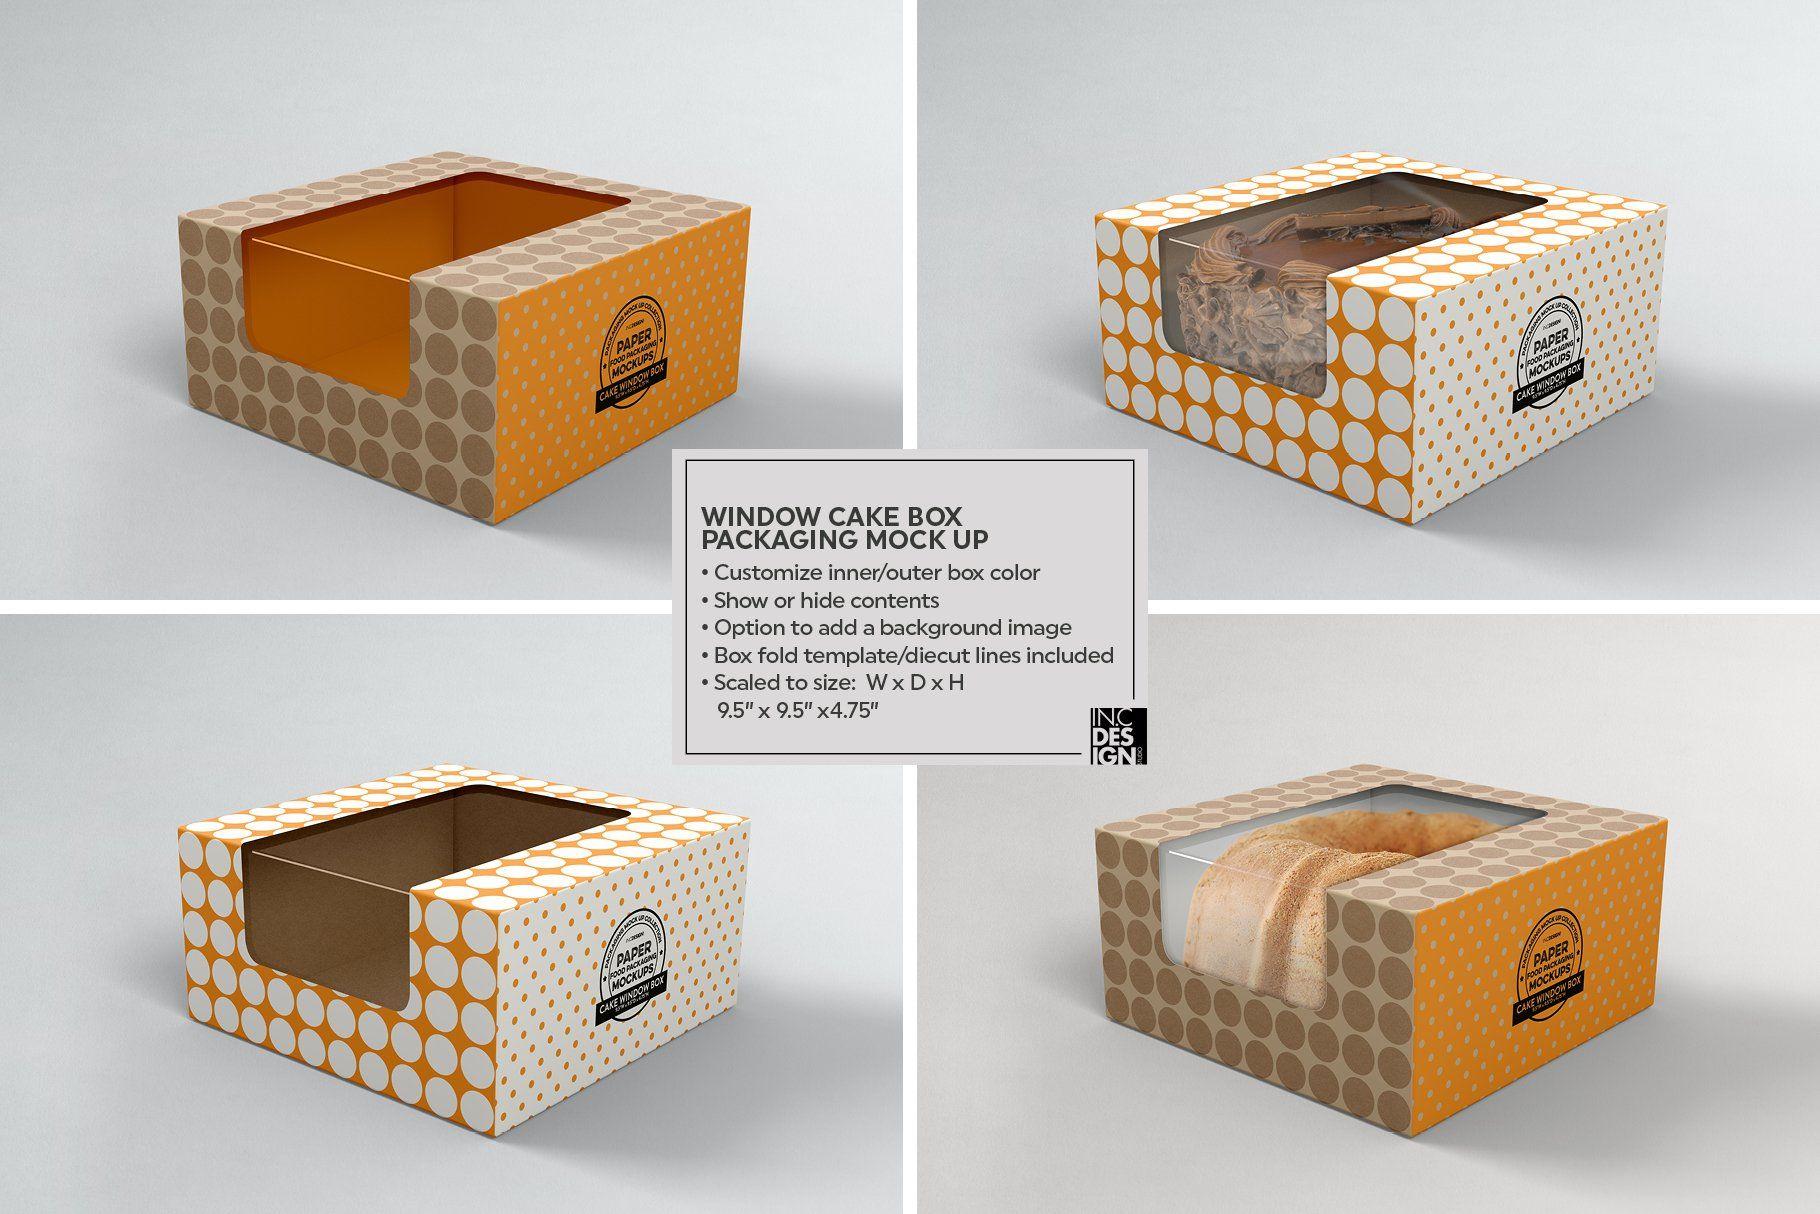 Download Cake Window Box Packaging Mockup Food Box Packaging Box Packaging Templates Box Packaging Design